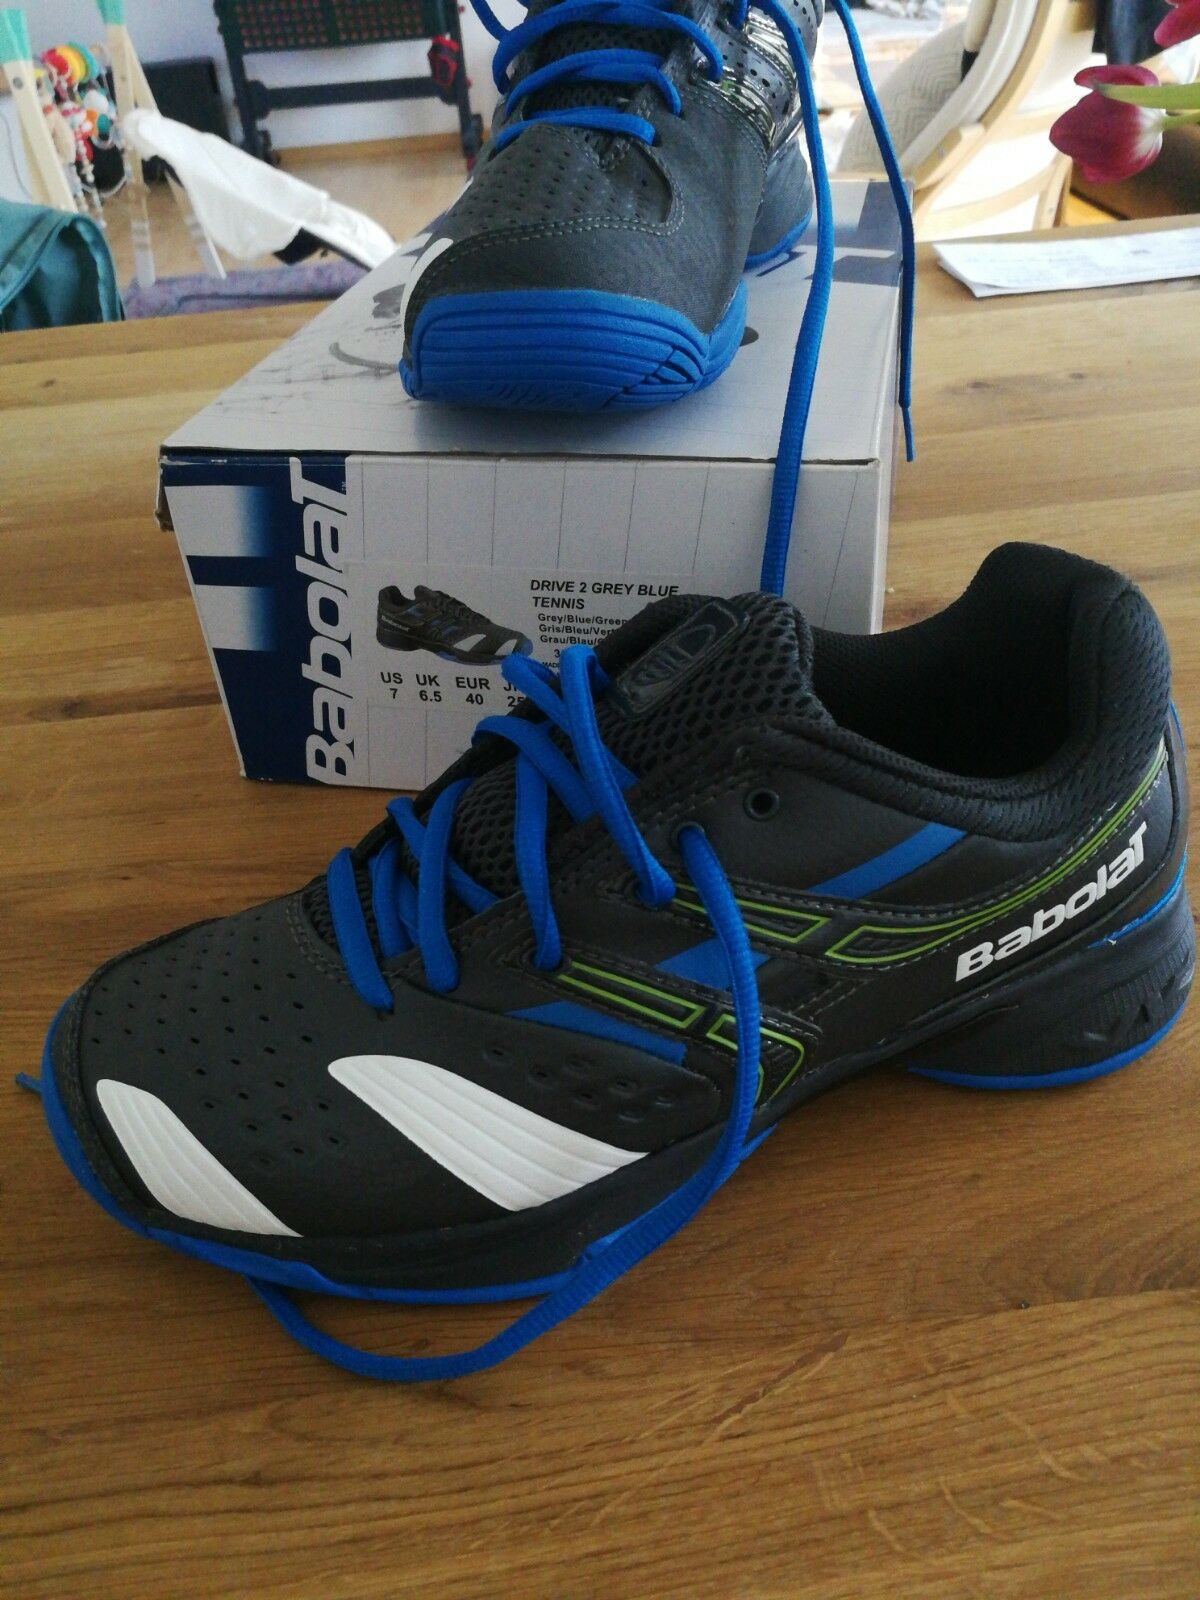 Babolat Drive 2 Tennis Schuhe NEU grau blau blau blau fb4cf8